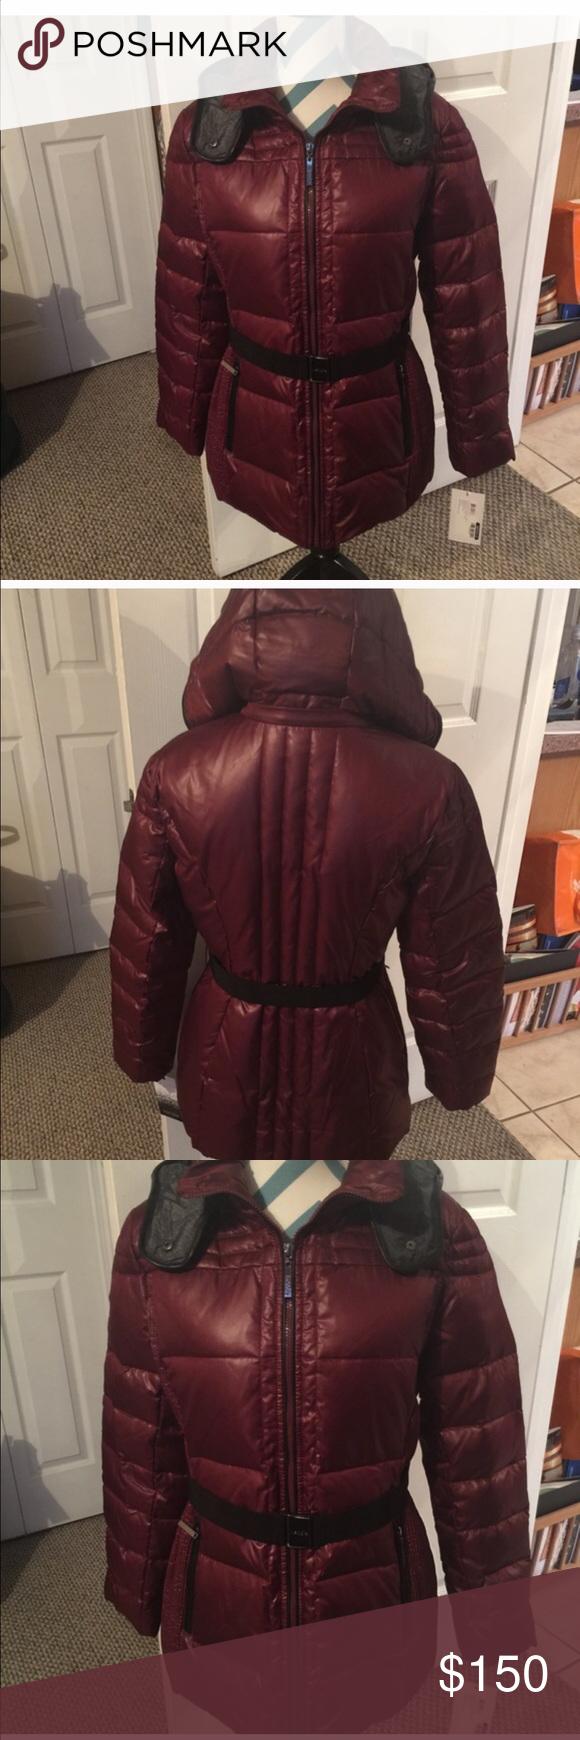 Kenzie dawn puffer jacket Jackets, Clothes design